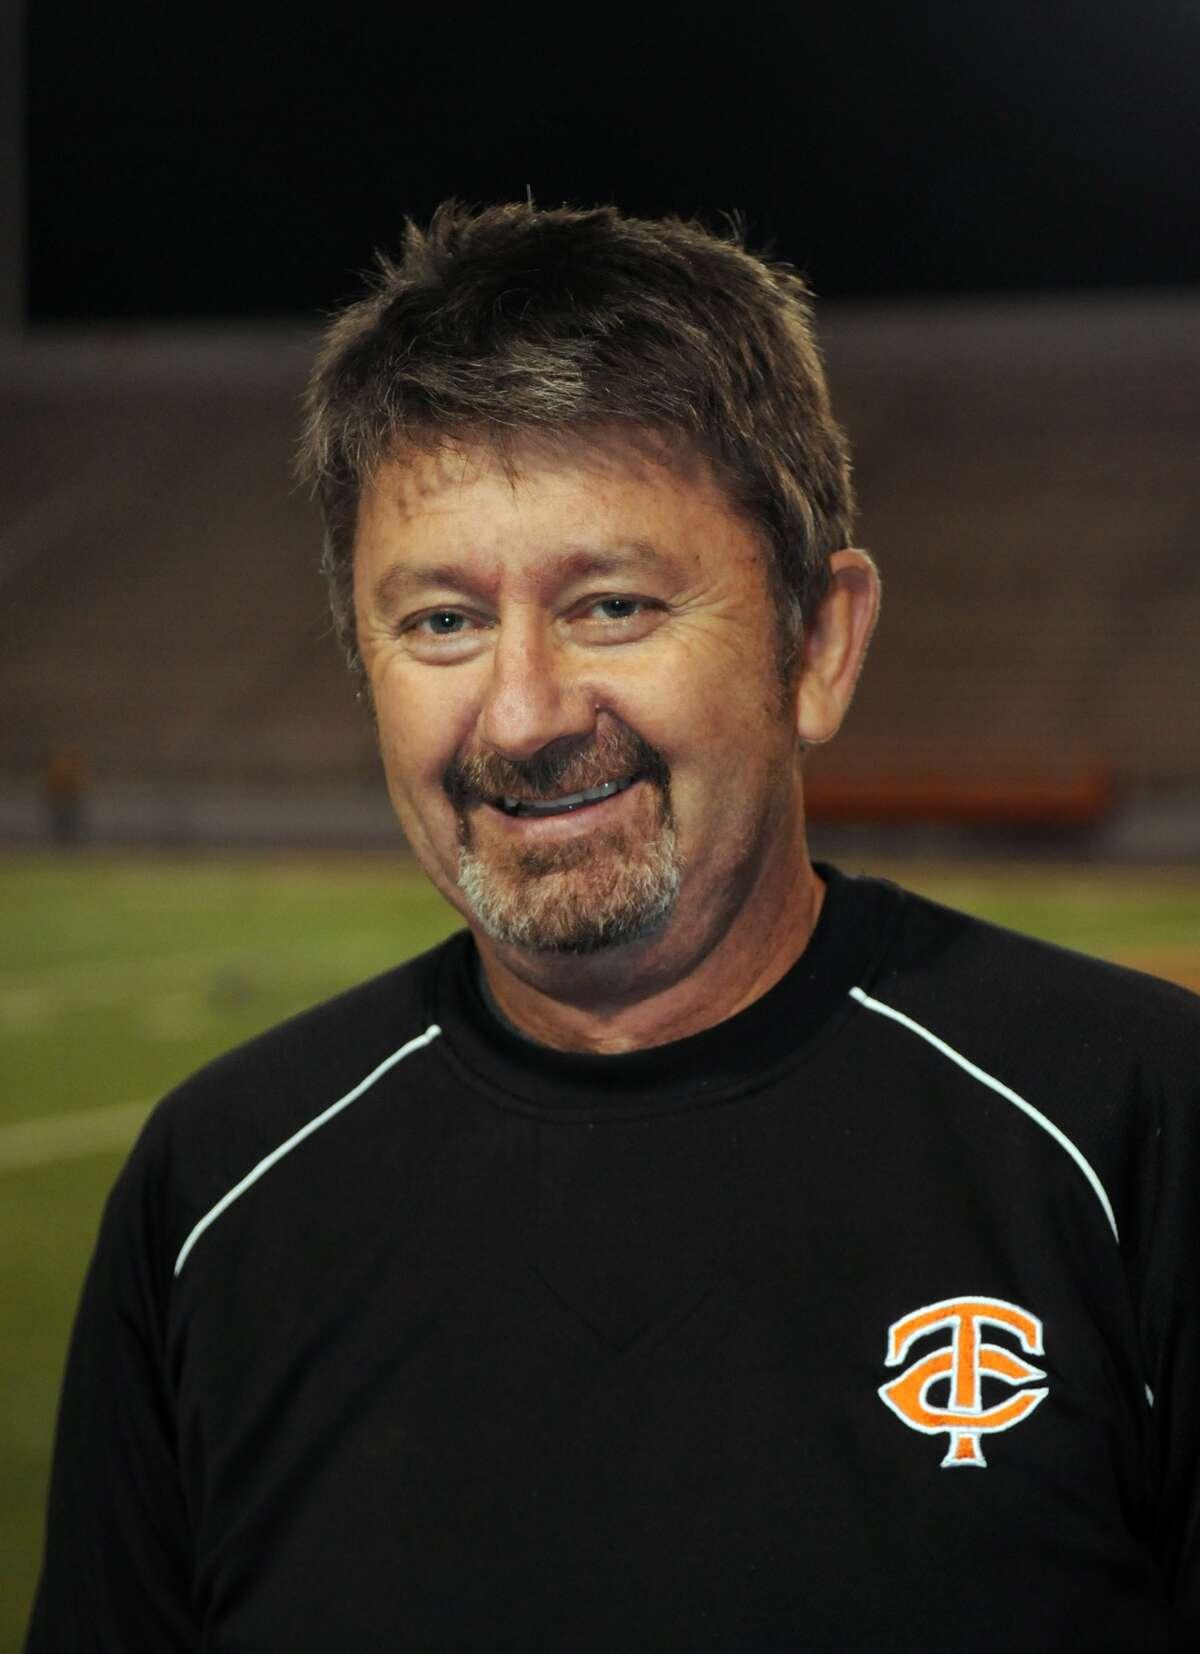 Txas City Head Girls Soccer coach Steve Allan